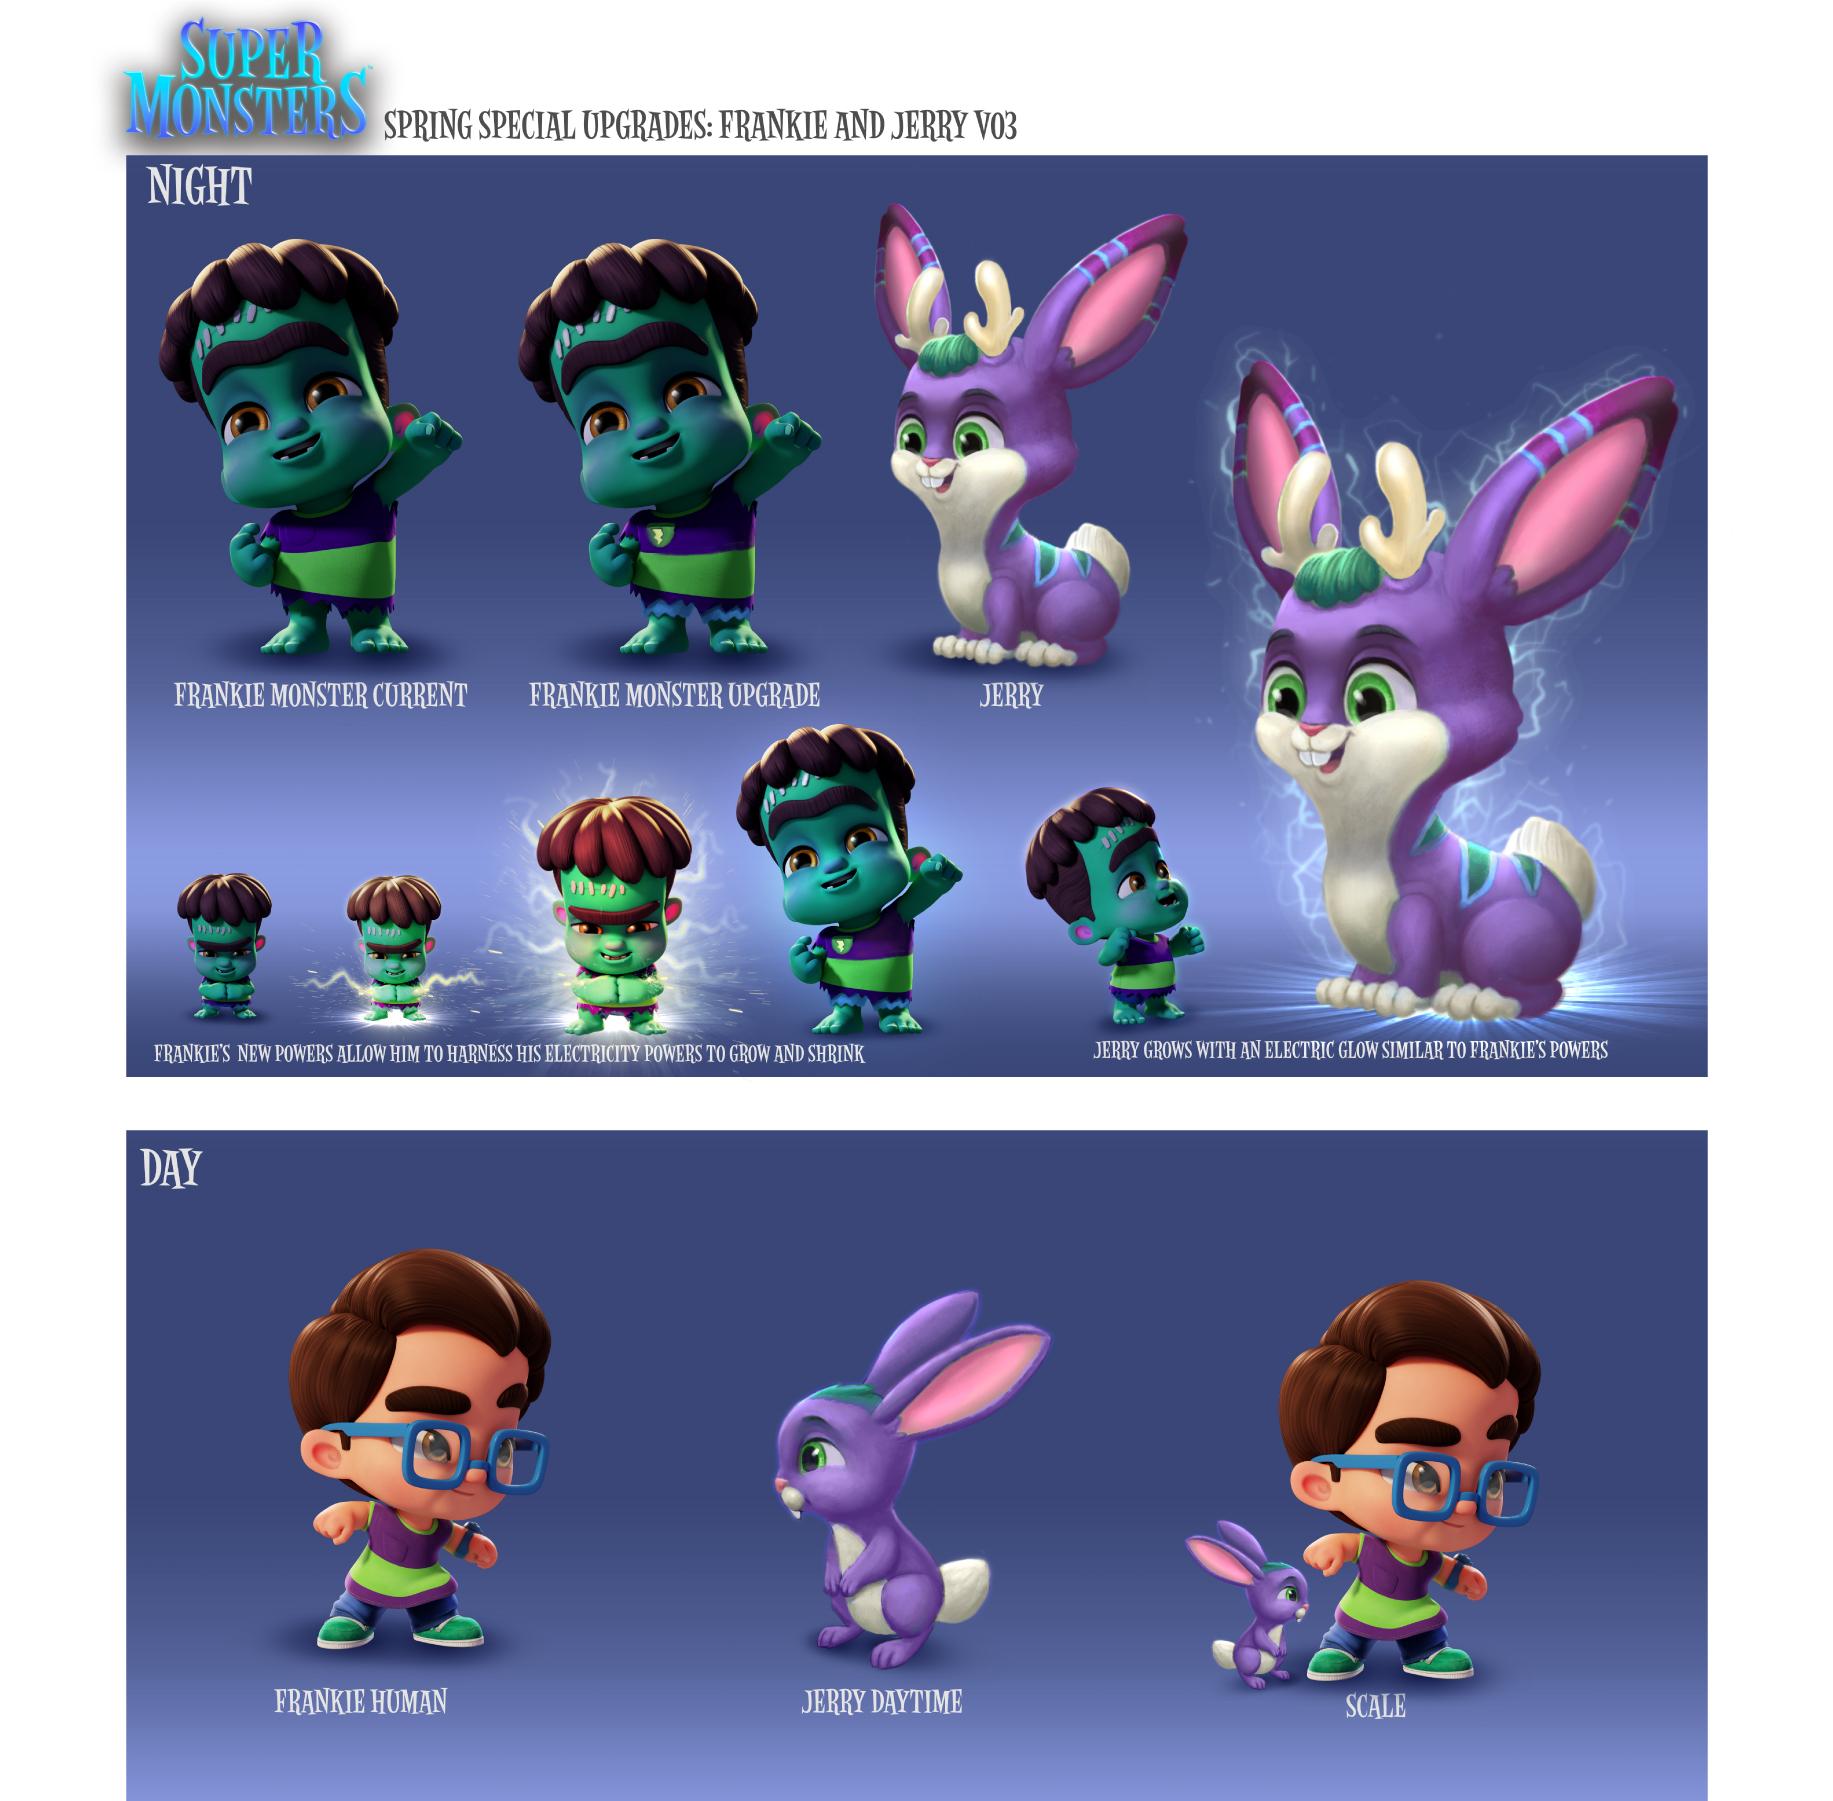 Super-Monsters-11.jpg